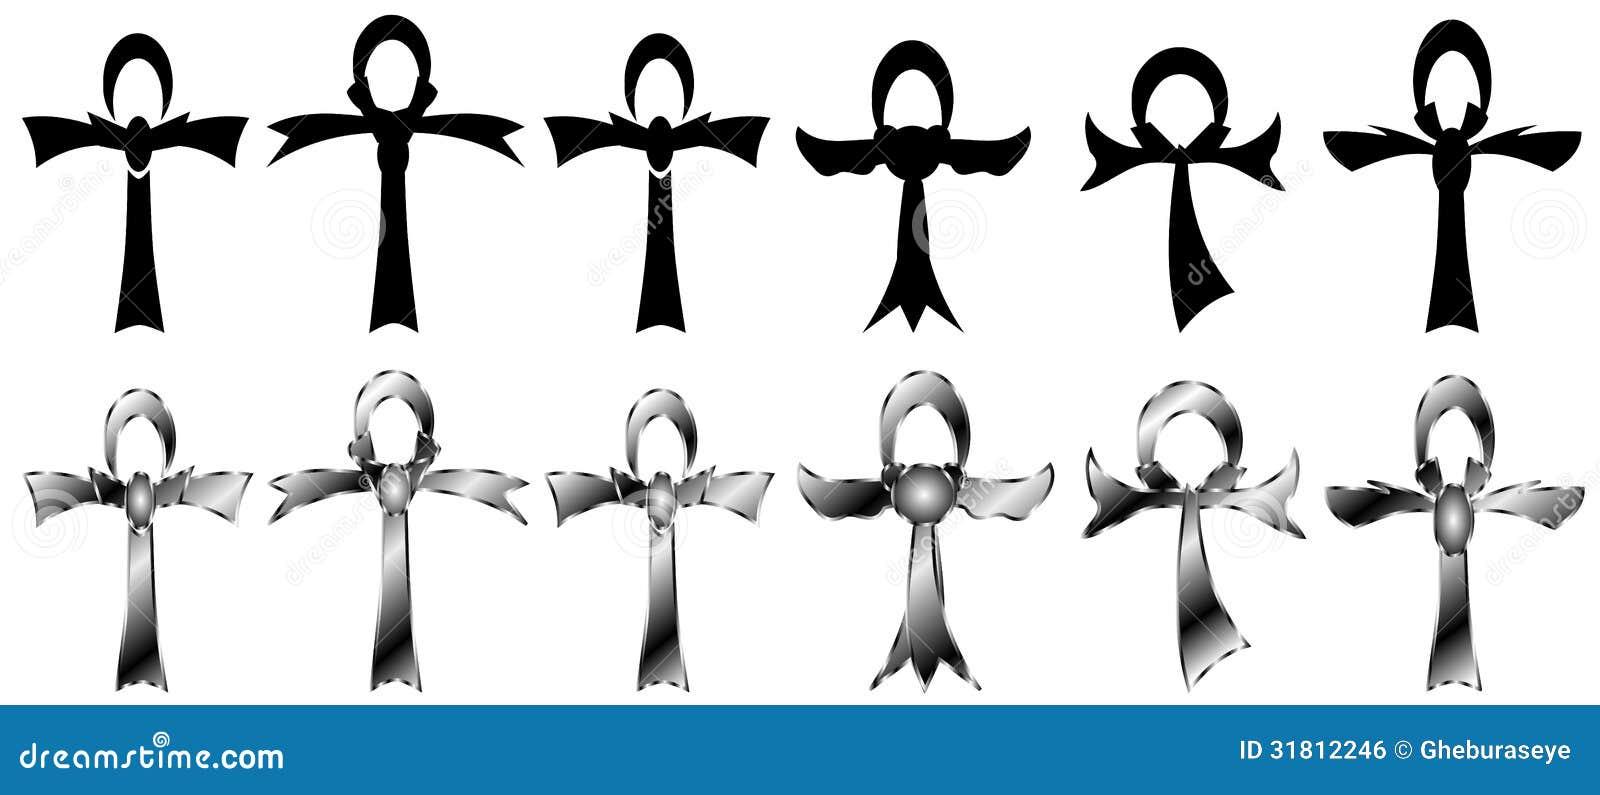 Egyptian Symbols For Life